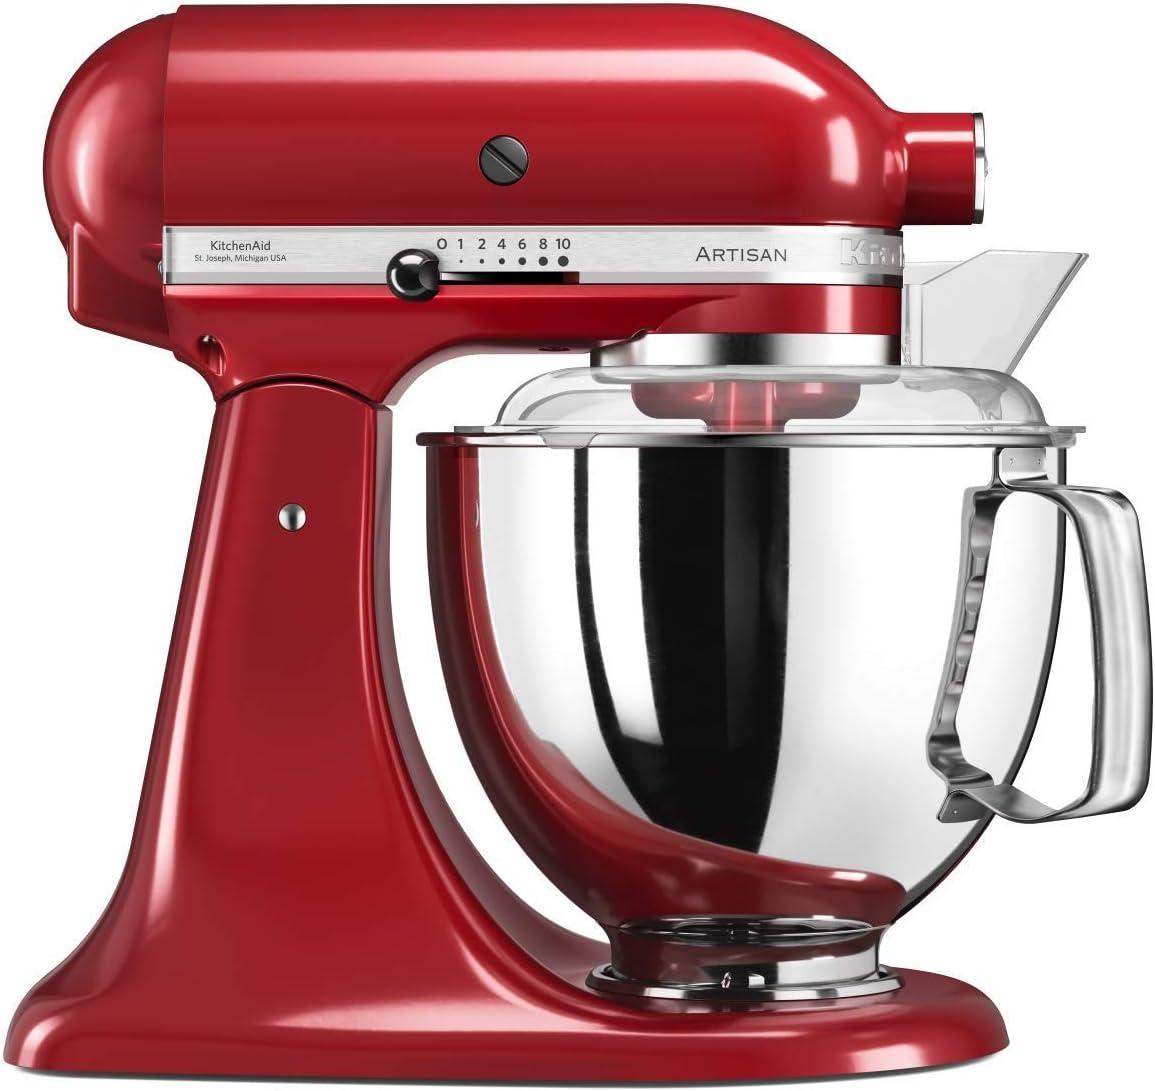 KitchenAid Artisan 5KSM175PS Robot de cocina (4,8 L, Rojo, palanca, 220 RPM, Acero inoxidable, 300 W)